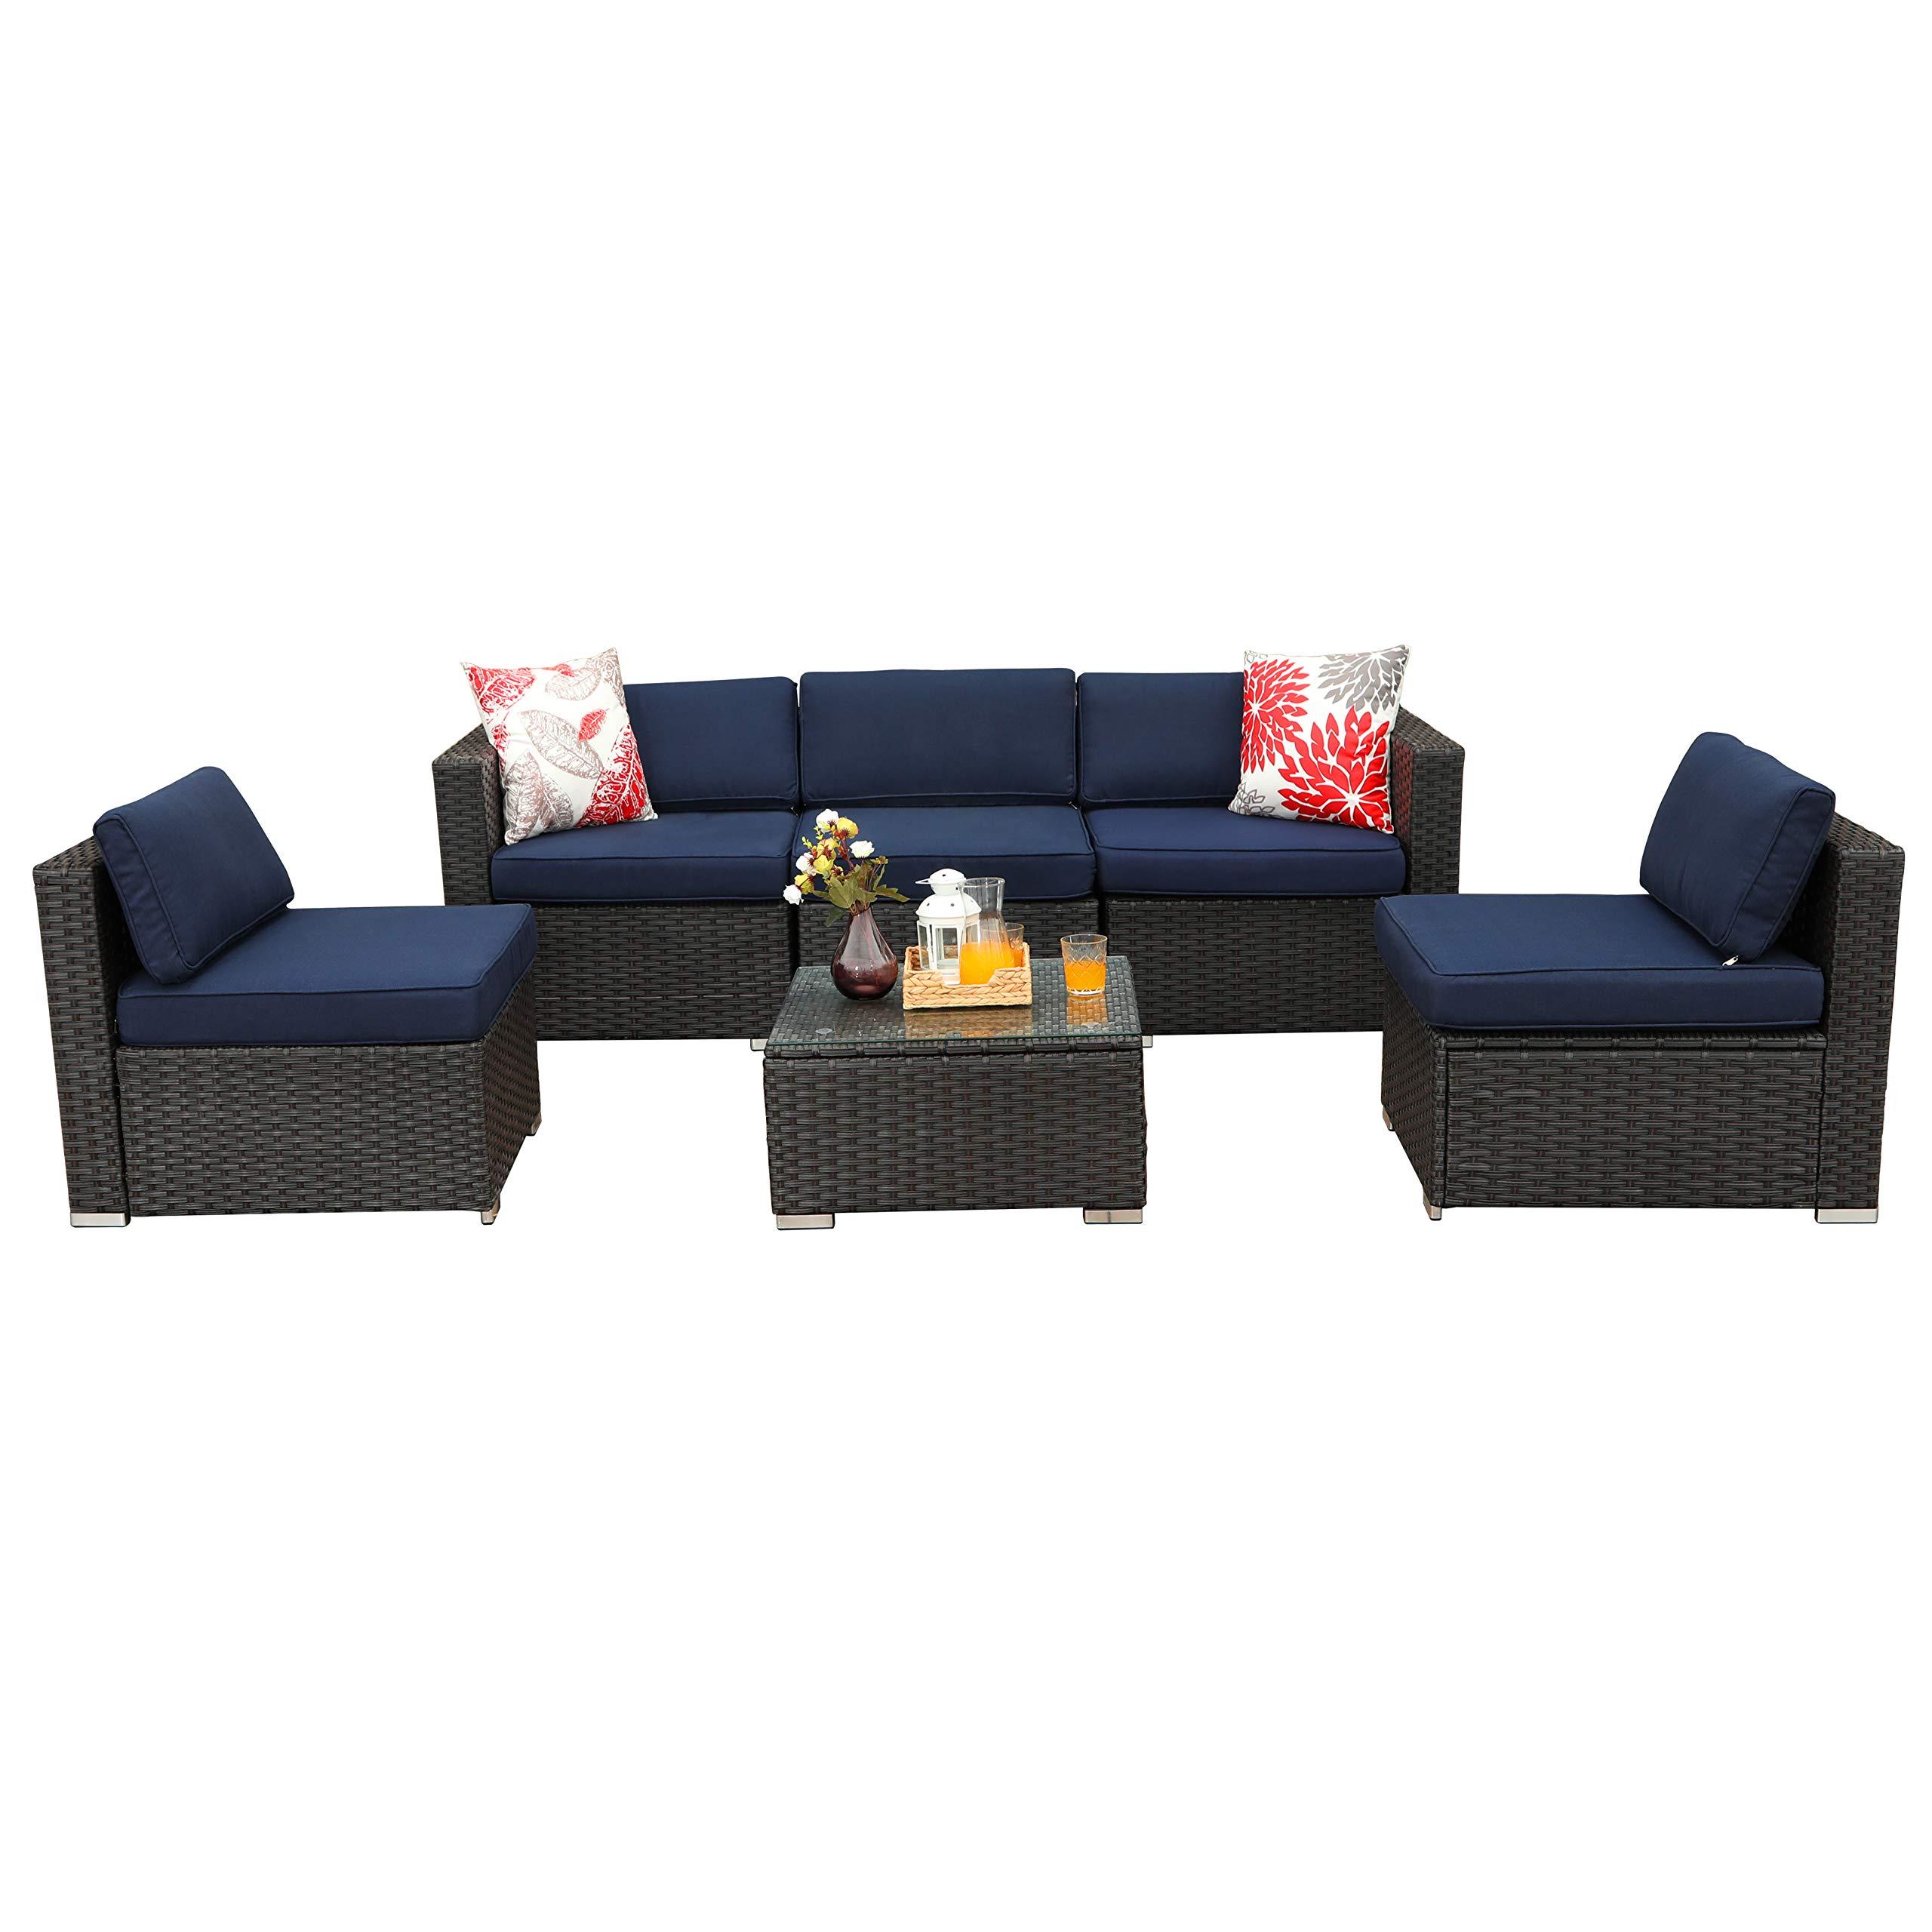 PHI VILLA 6-Piece Outdoor Sectional Sofa Rattan Patio Furniture Set Conversation Set with Tea Table, Blue by PHI VILLA